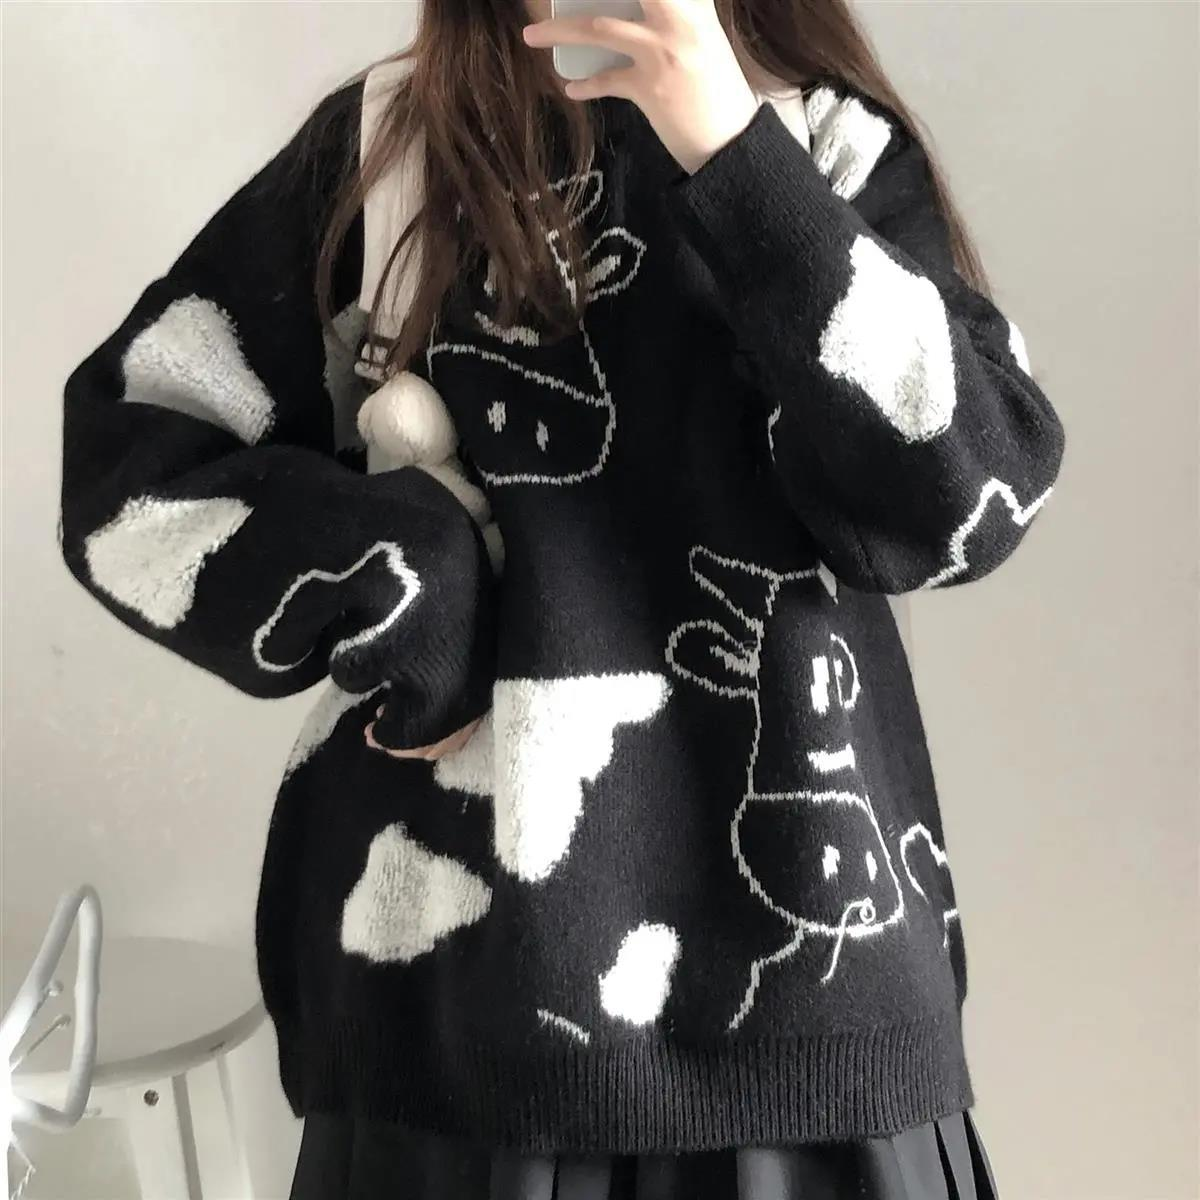 Egirl Harajuku pullover with a cow print 47